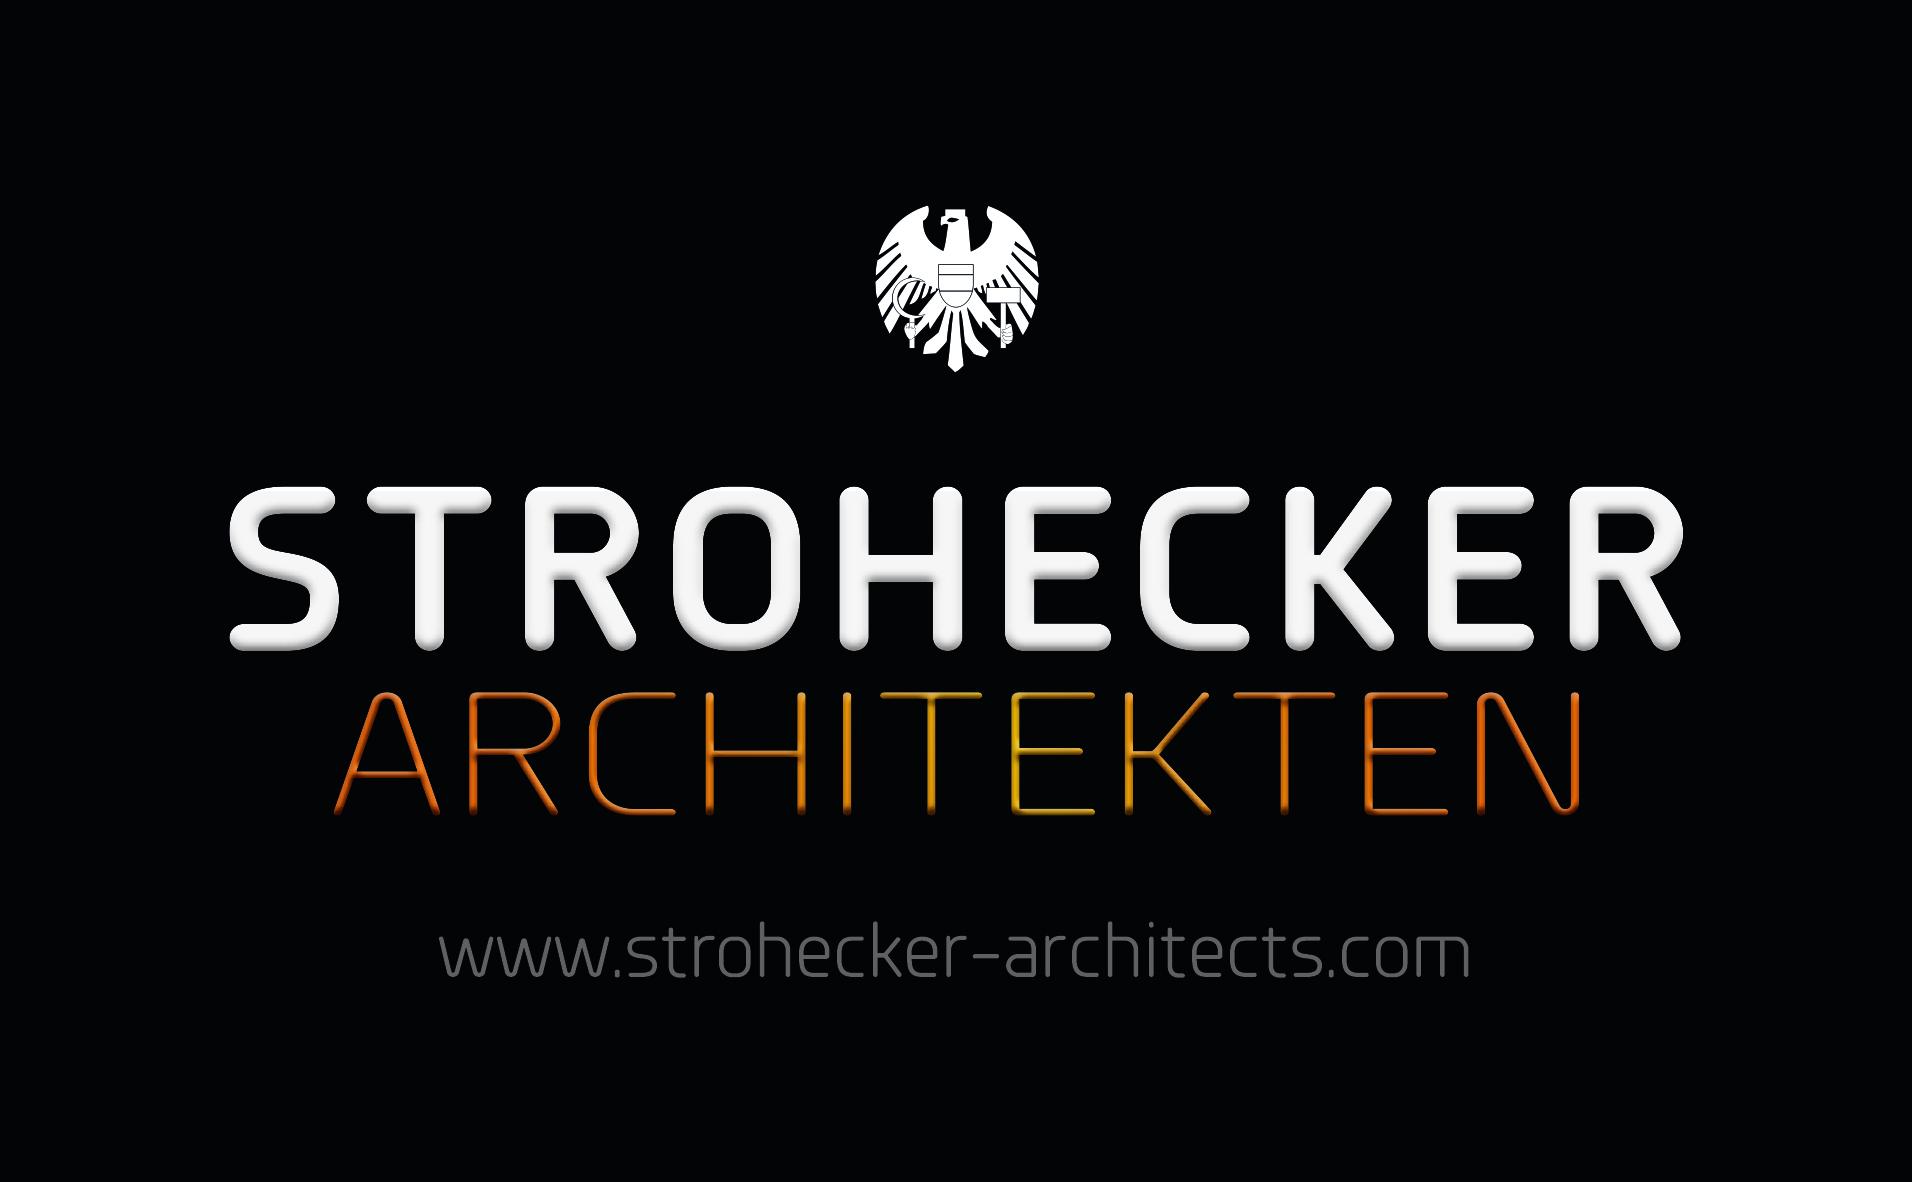 logo_strohecker-architects_weiss